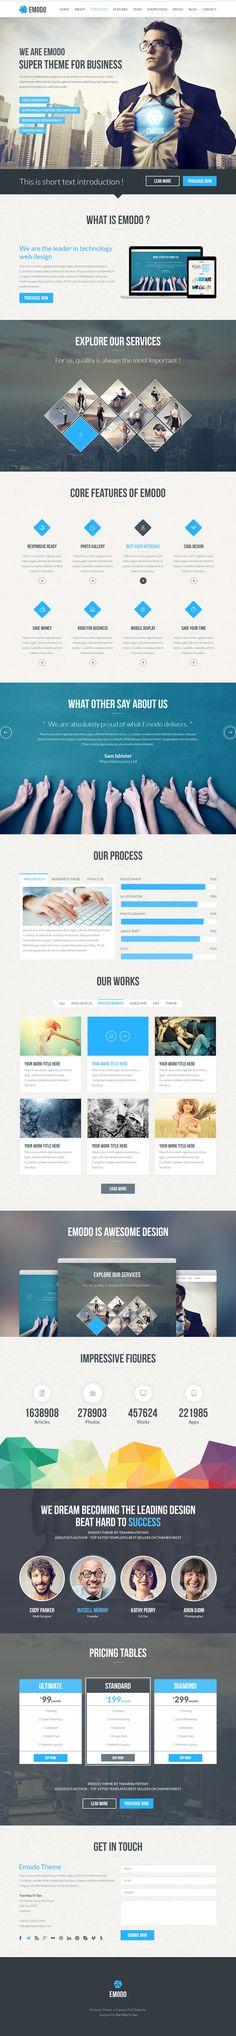 Emodo Premium One-Page Business  #psdtemplates #creativetemplates #businesstemplates #html5templates #responsivetemplates